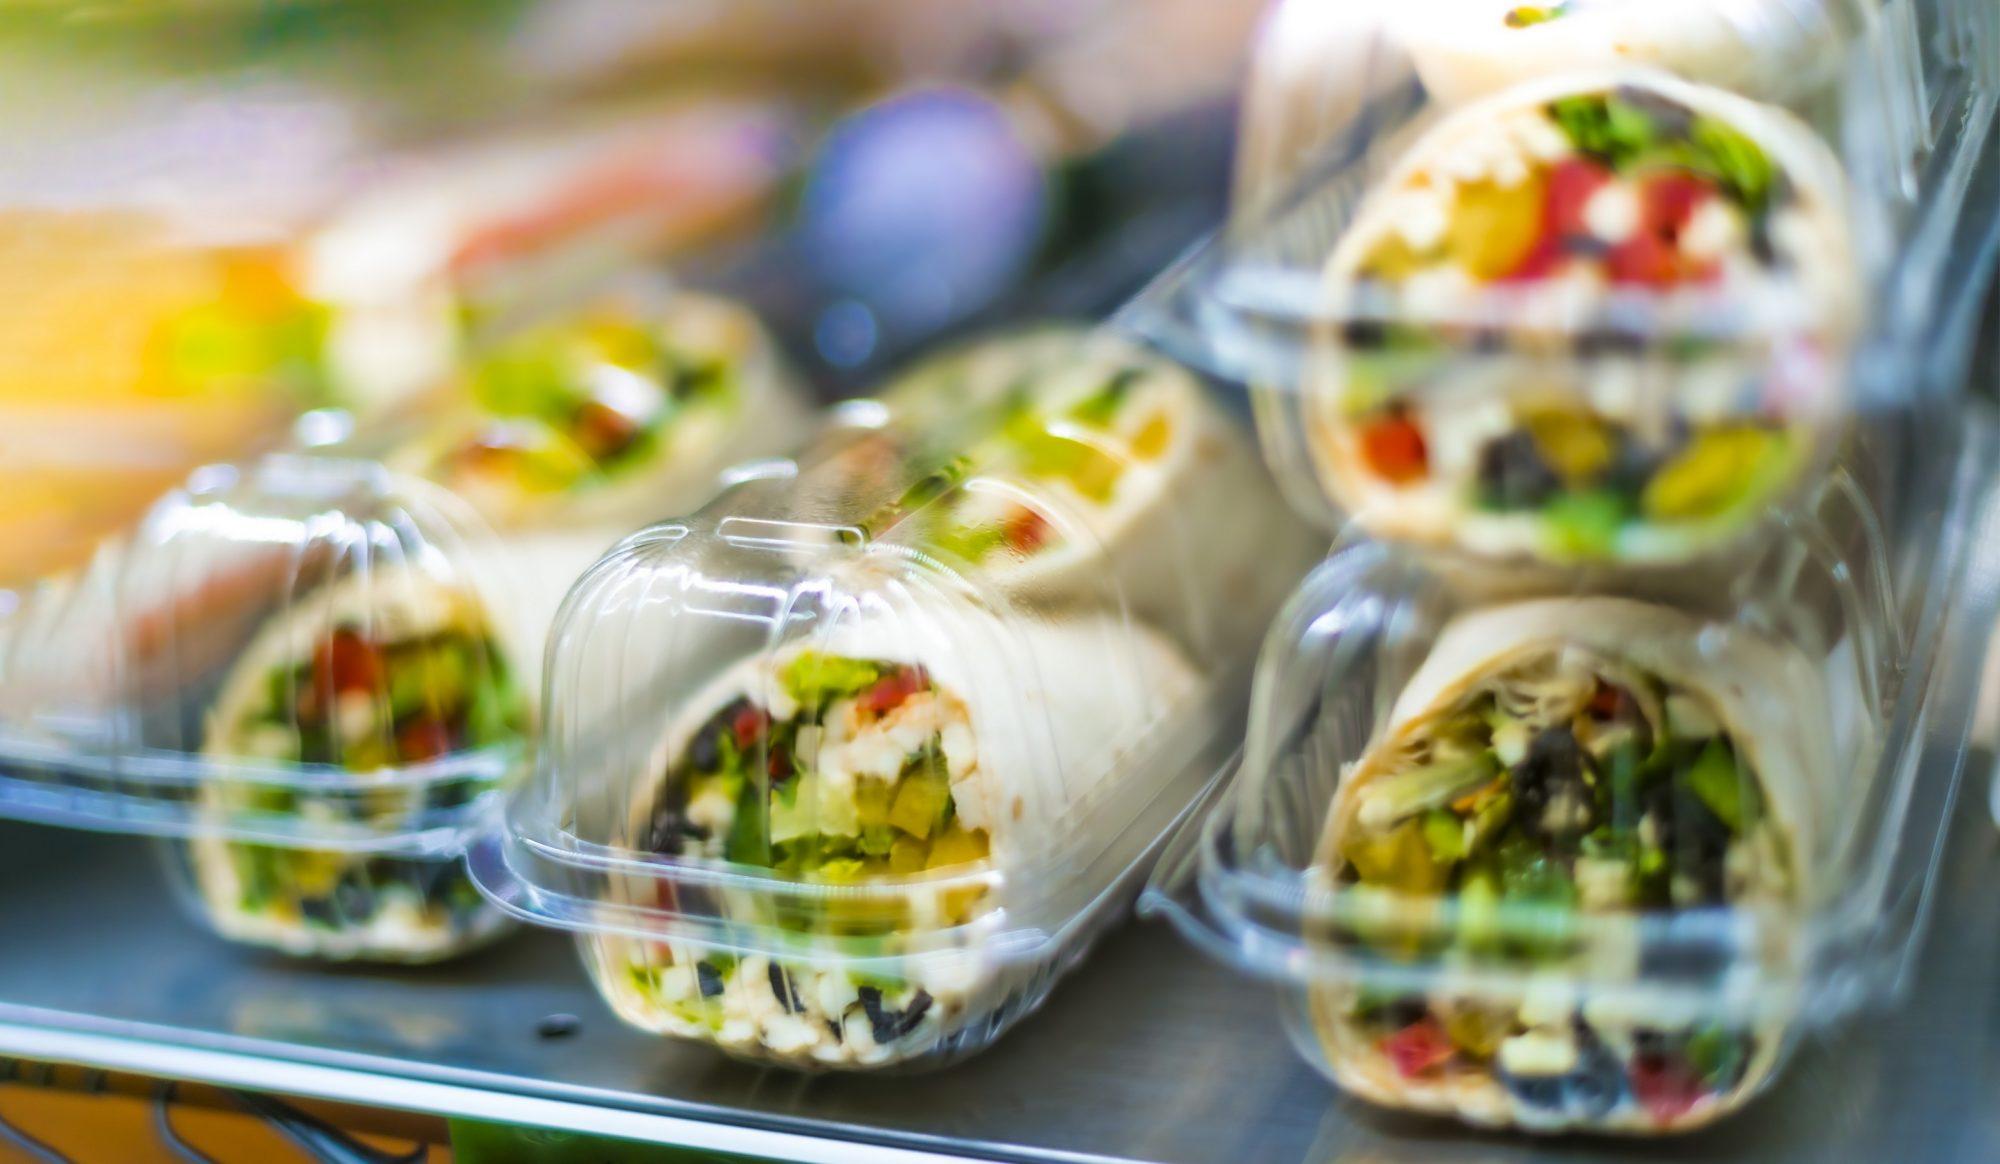 Bowling Green Micro-Market | Break Room | Healthy Products | Open Market